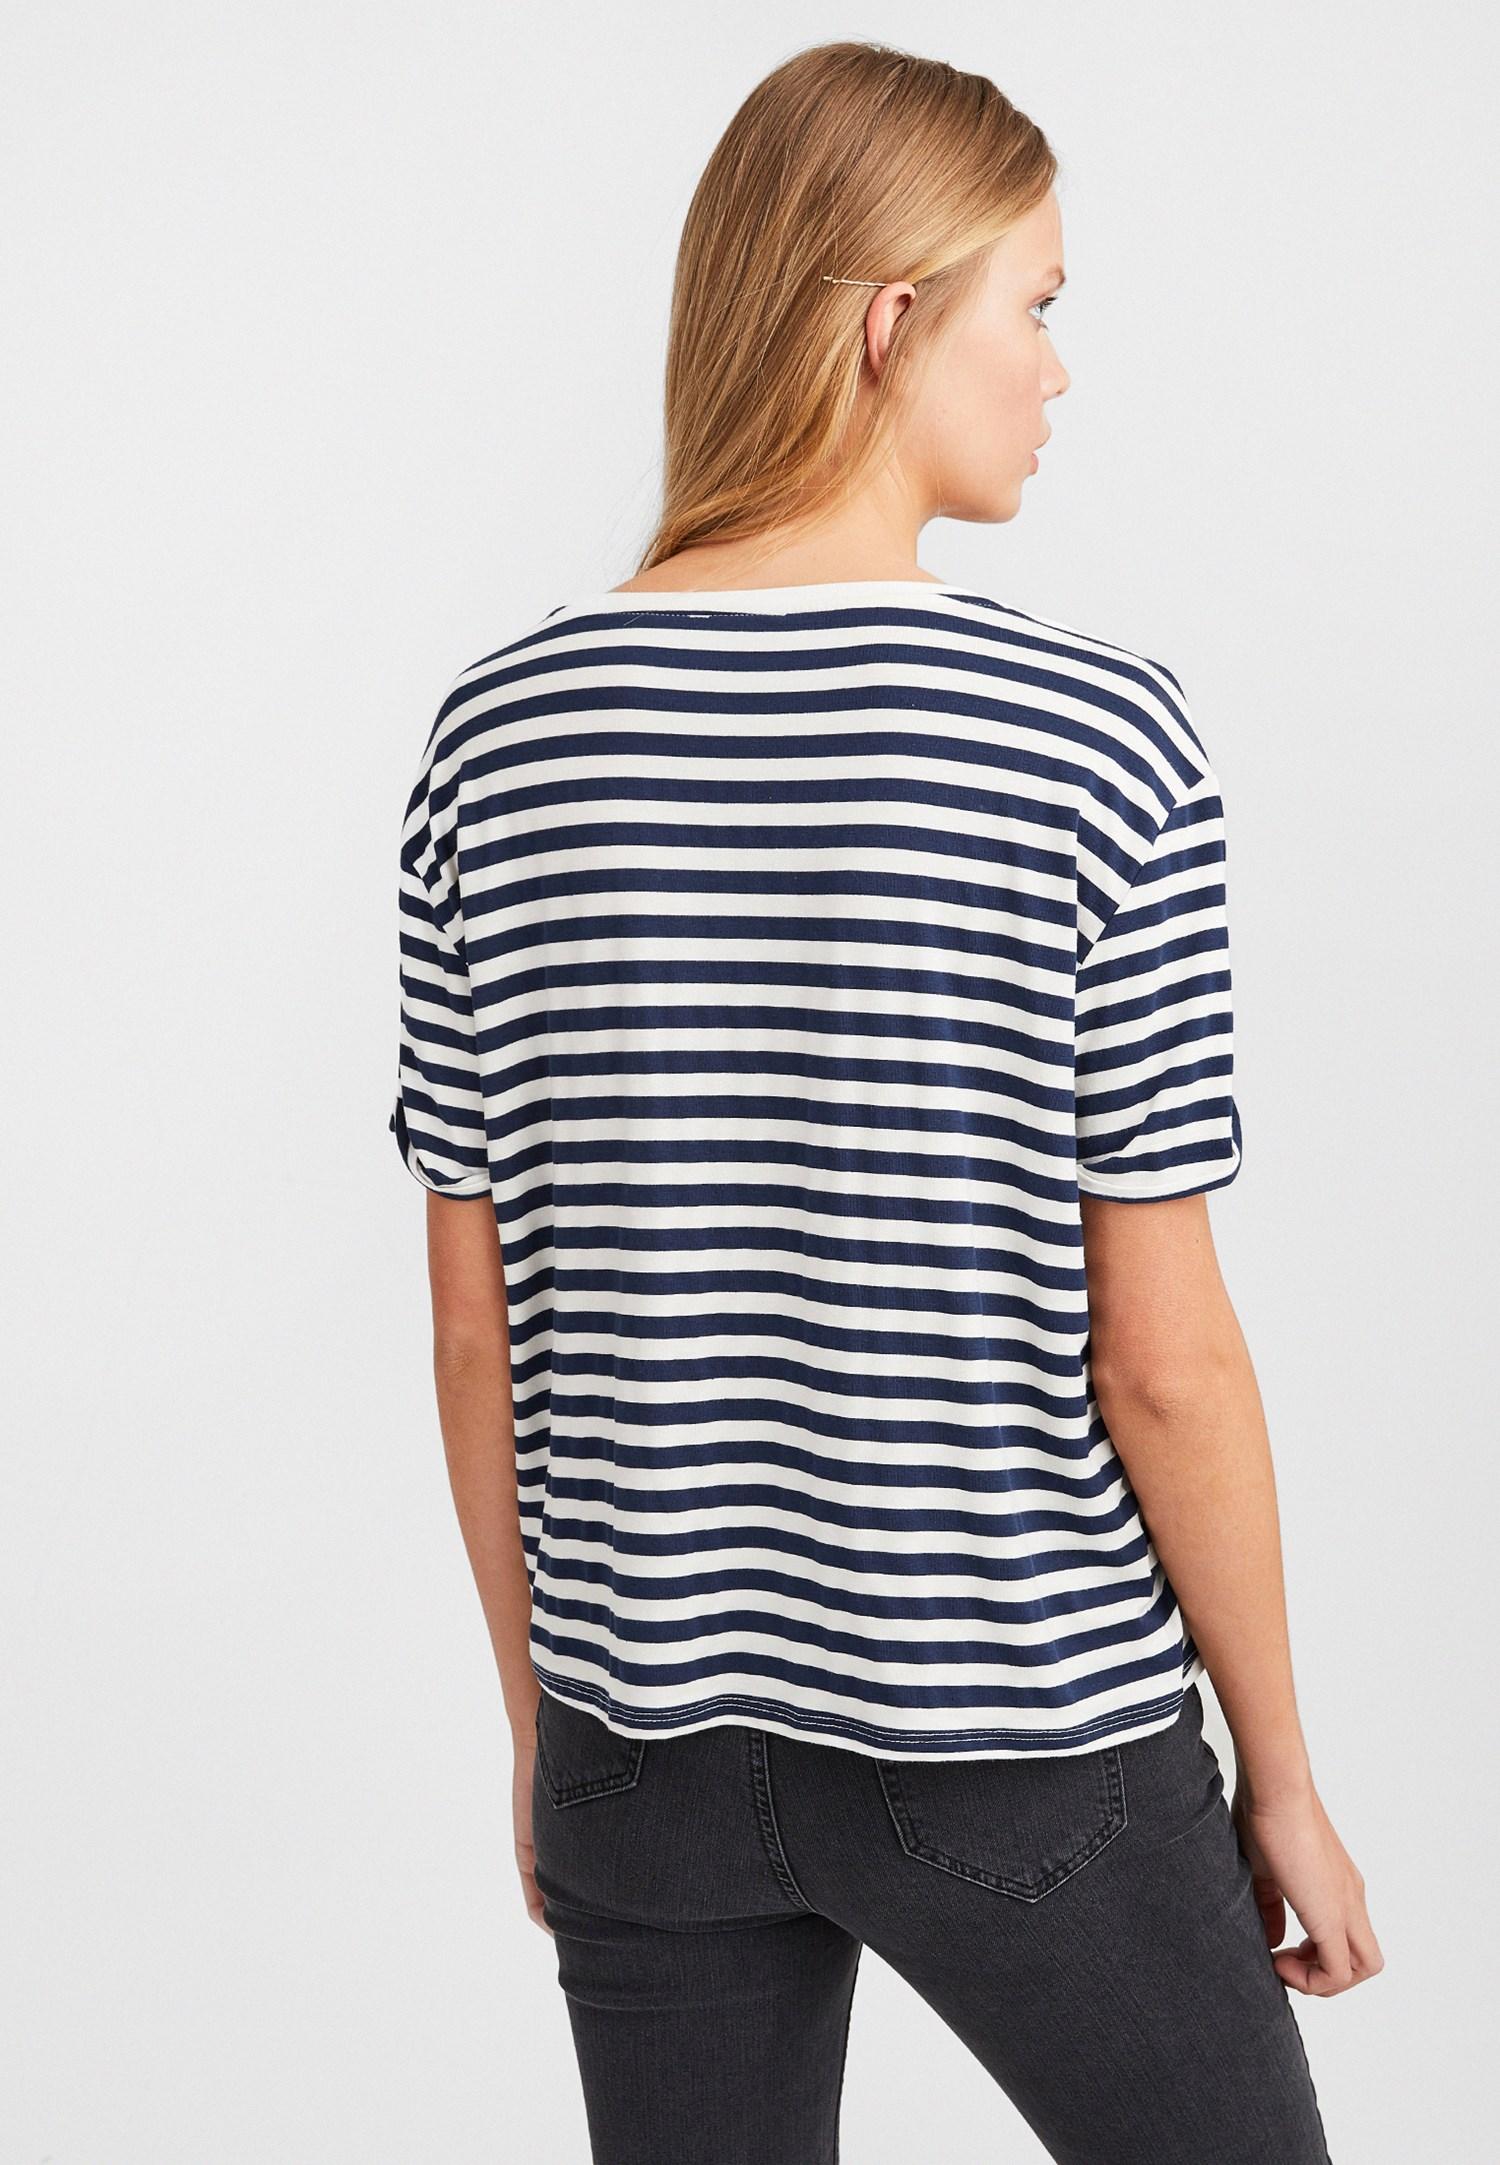 Bayan Çok Renkli Baskı Detaylı Çizgili T-Shirt